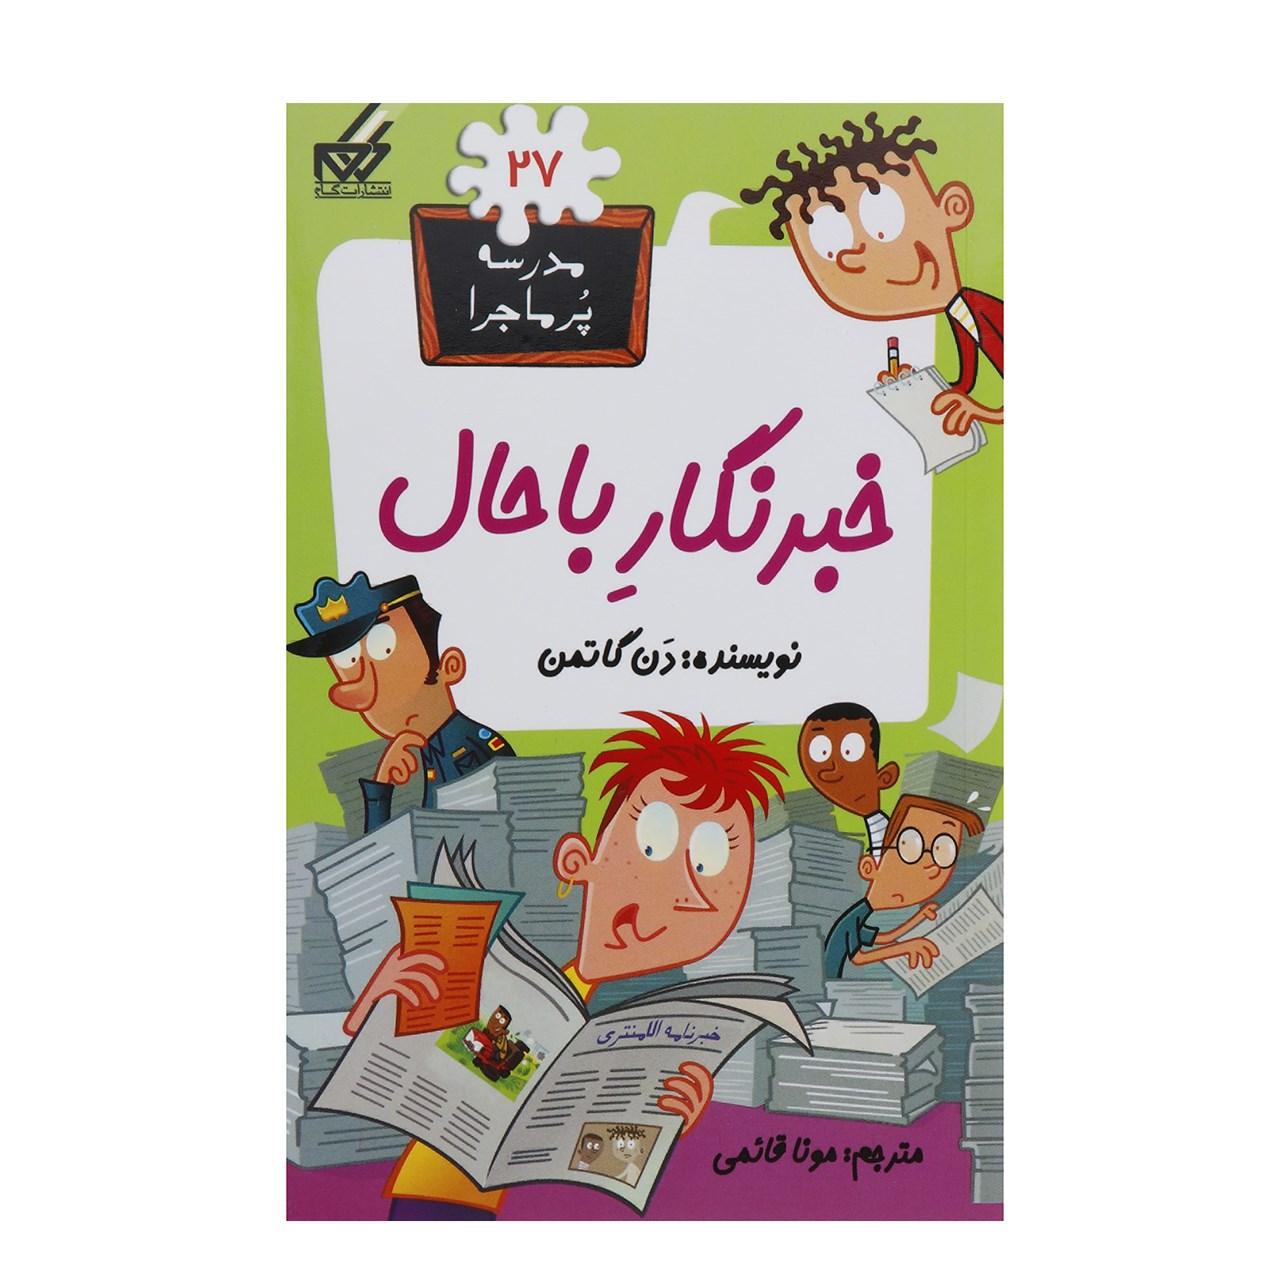 کتاب مدرسه پر ماجرا  27 خبرنگار با حال اثر دن گاتمن